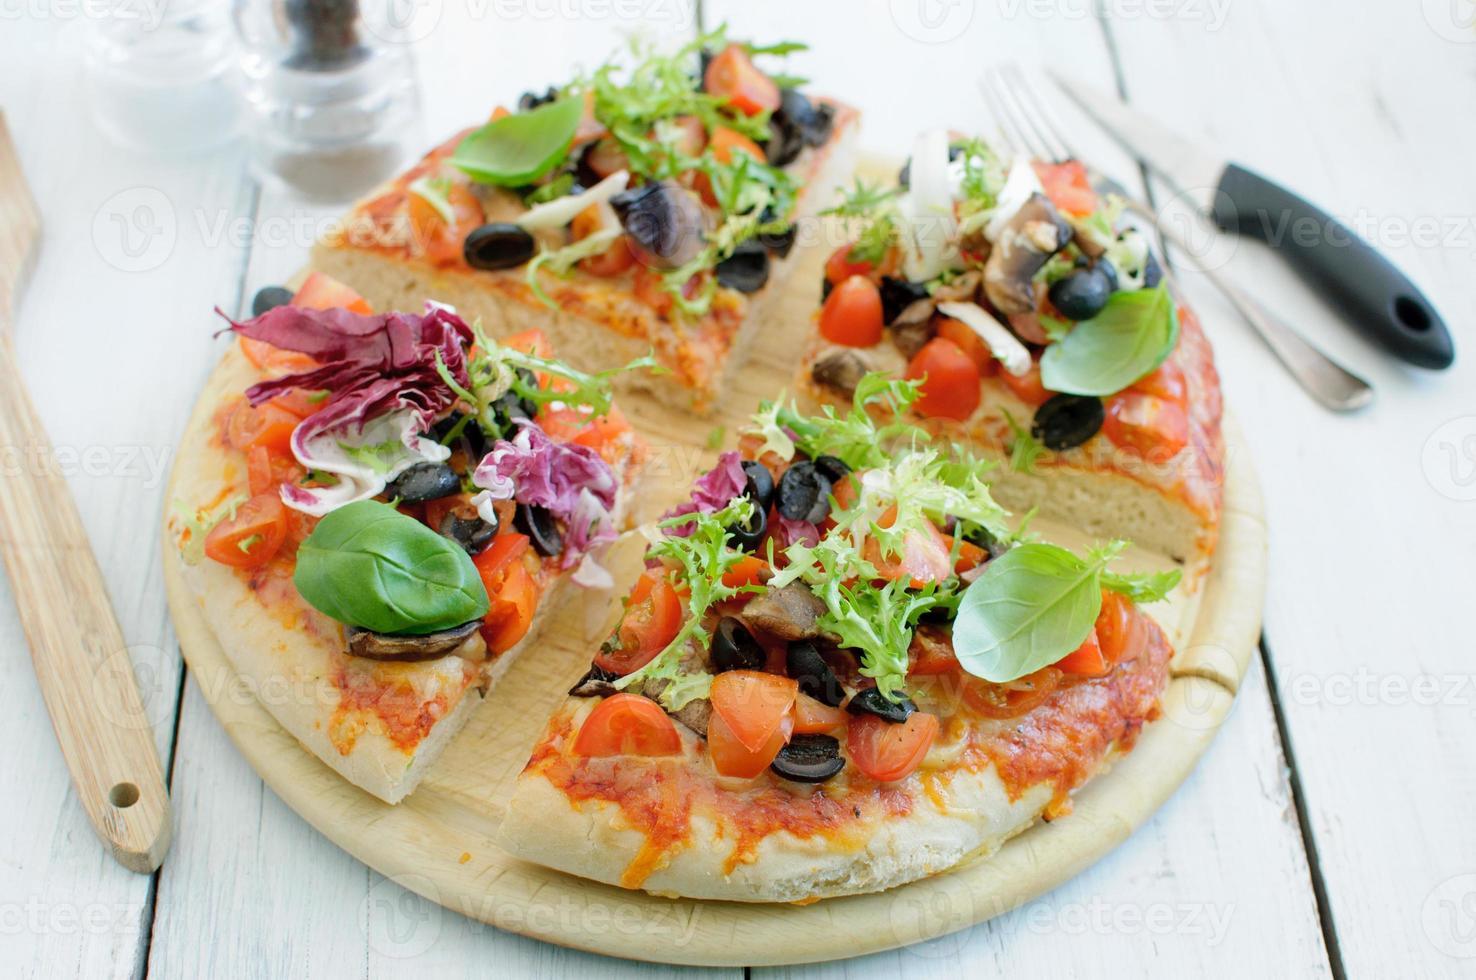 Gourmet pizza photo